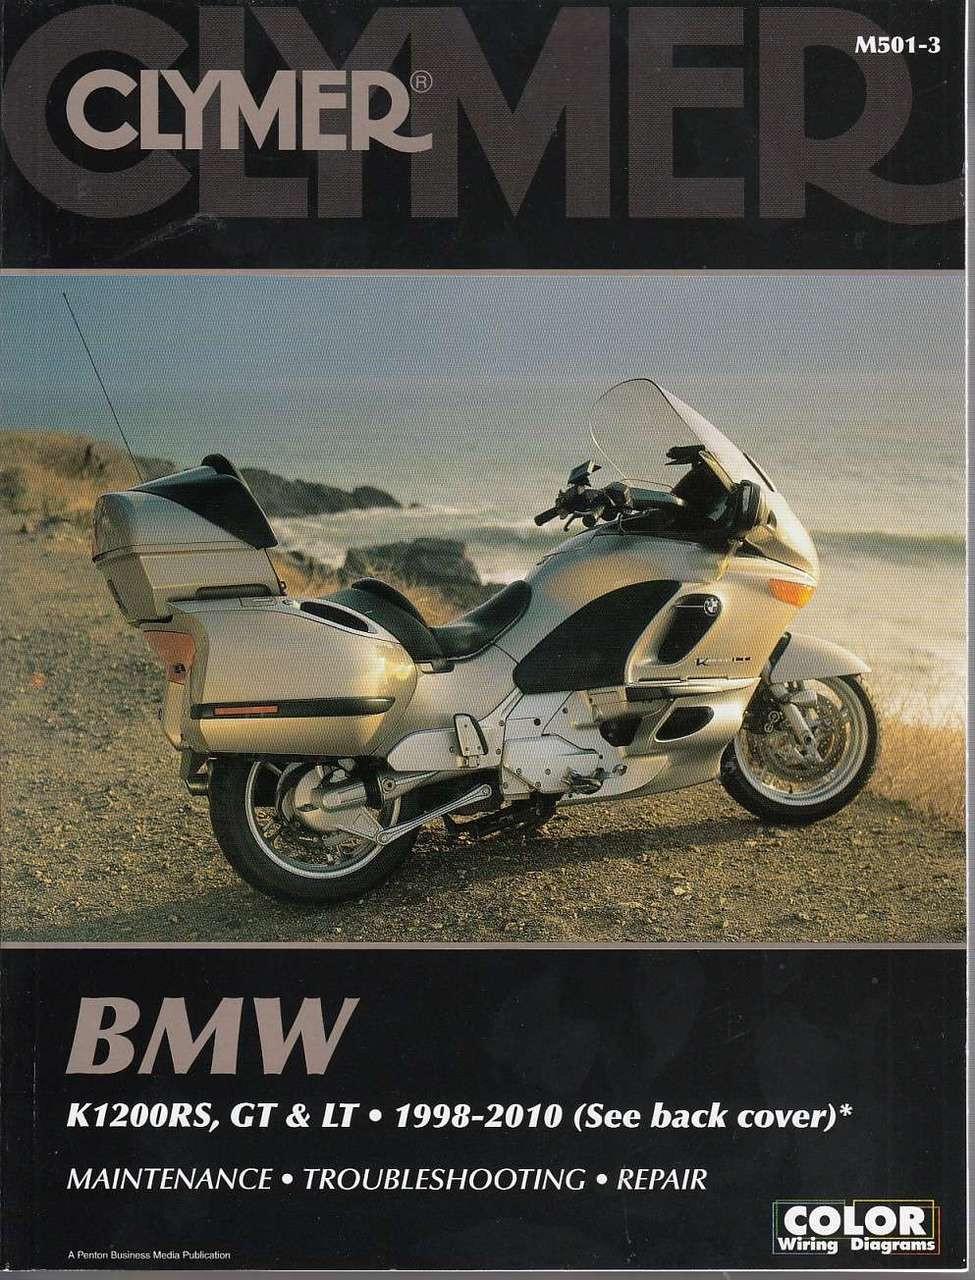 bmw k1200rs k1200gt k1200lt 1998 2010 workshop manual rh automotobookshop  com au BMW K1300S bmw k1200rs gt service repair manual